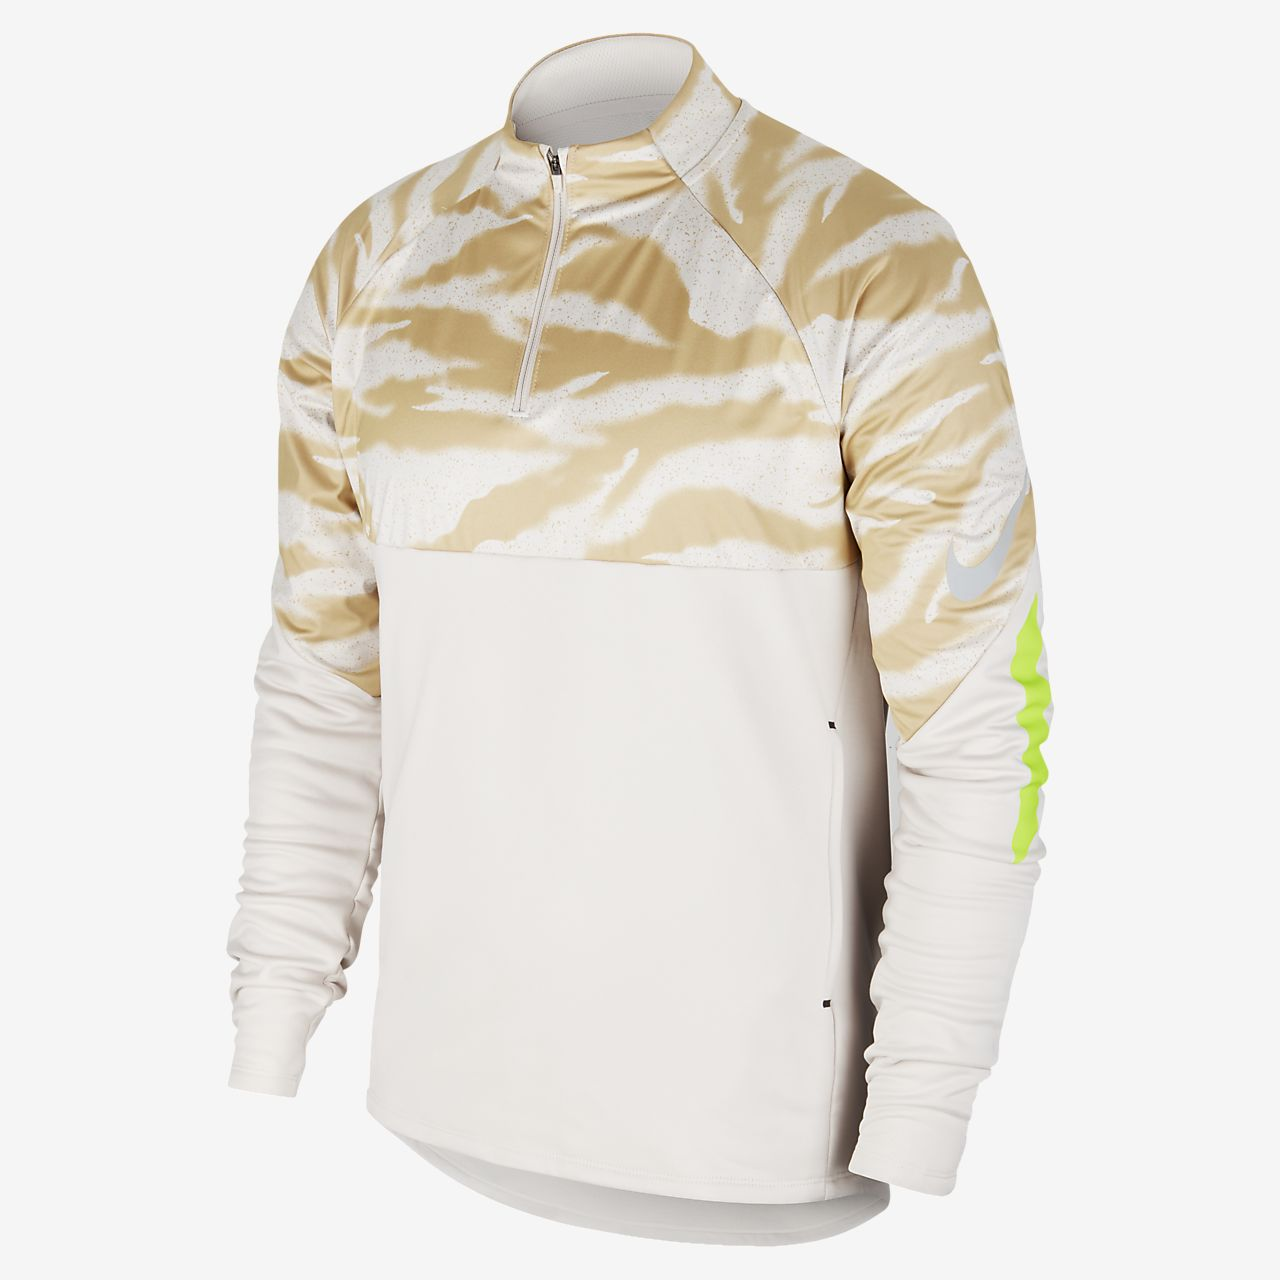 Pánská fotbalová tréninková mikina Nike Therma Shield Strike